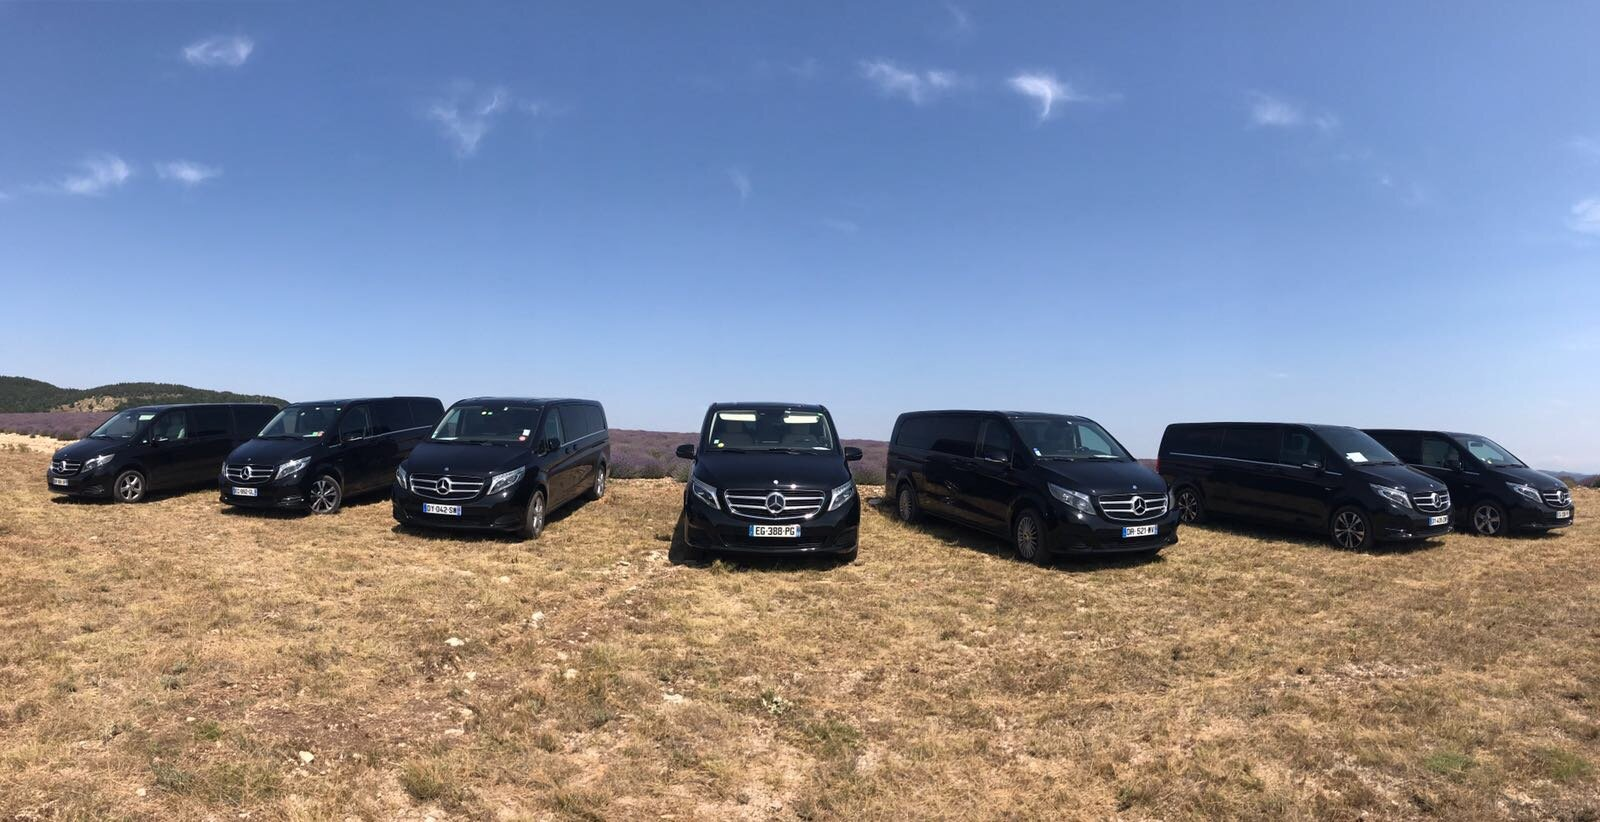 vip-limousine-france